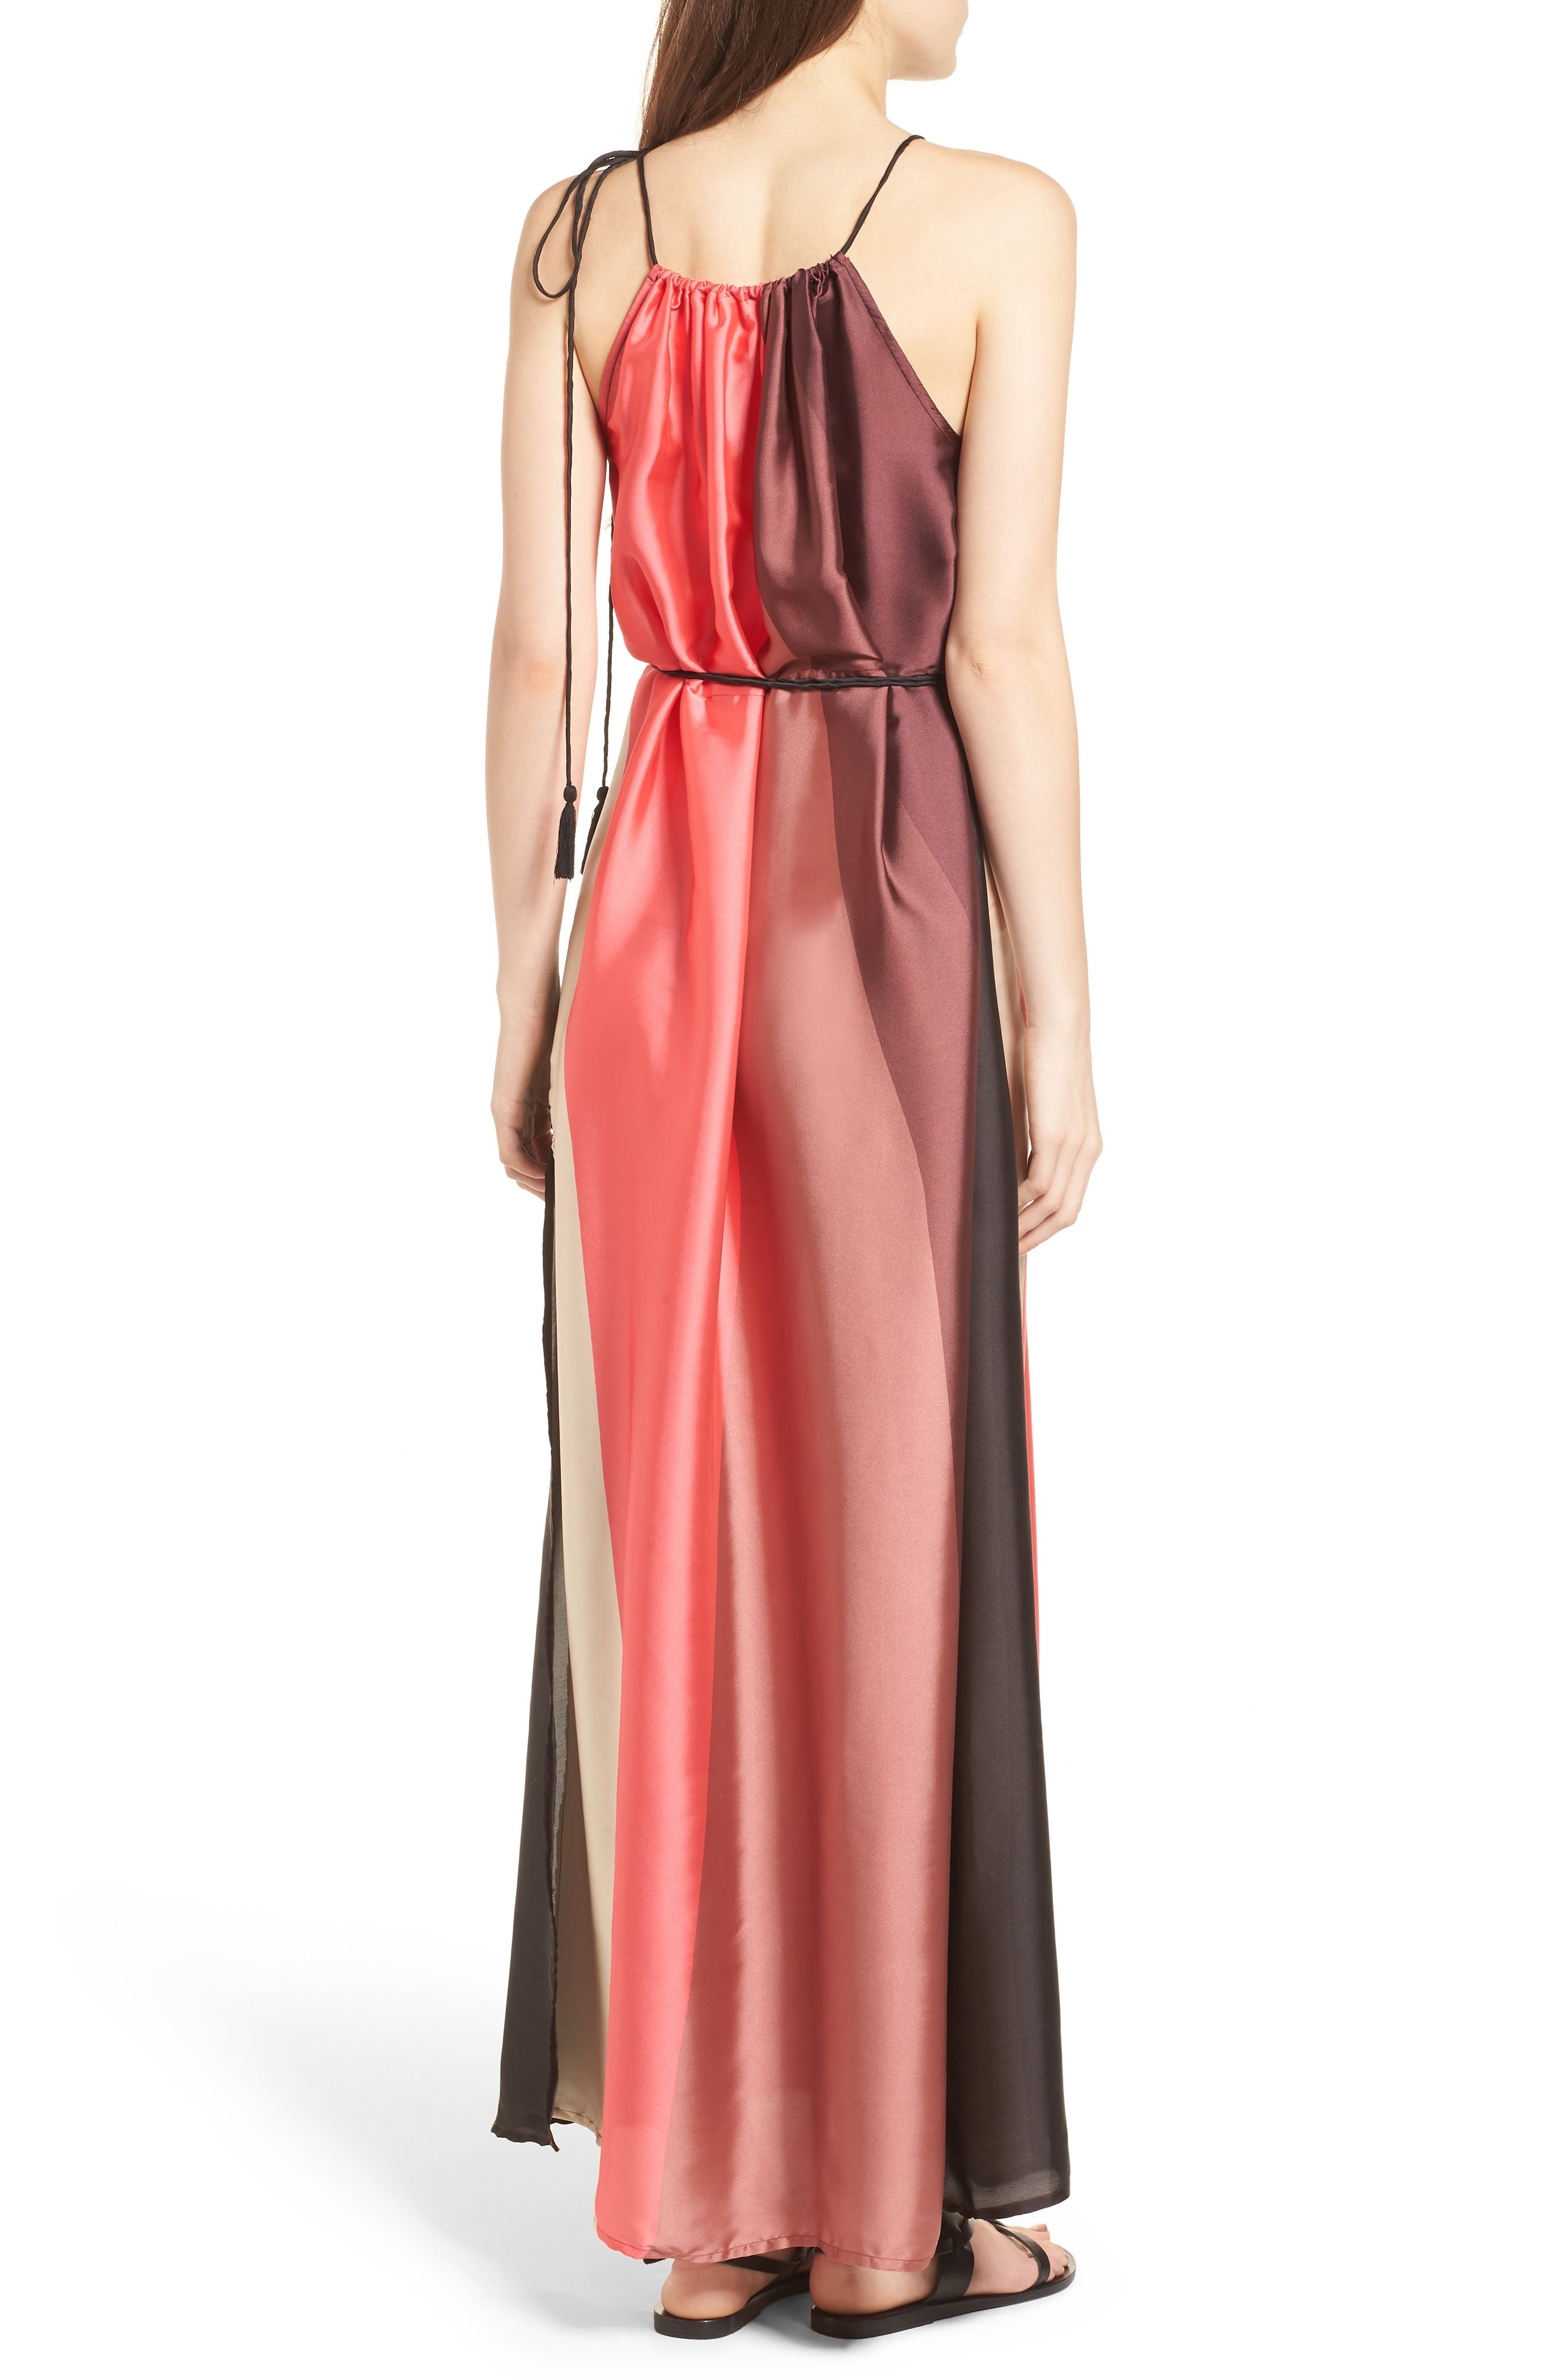 Icy Shores Maxi Dress,                             Alternate thumbnail 2, color,                             Multi